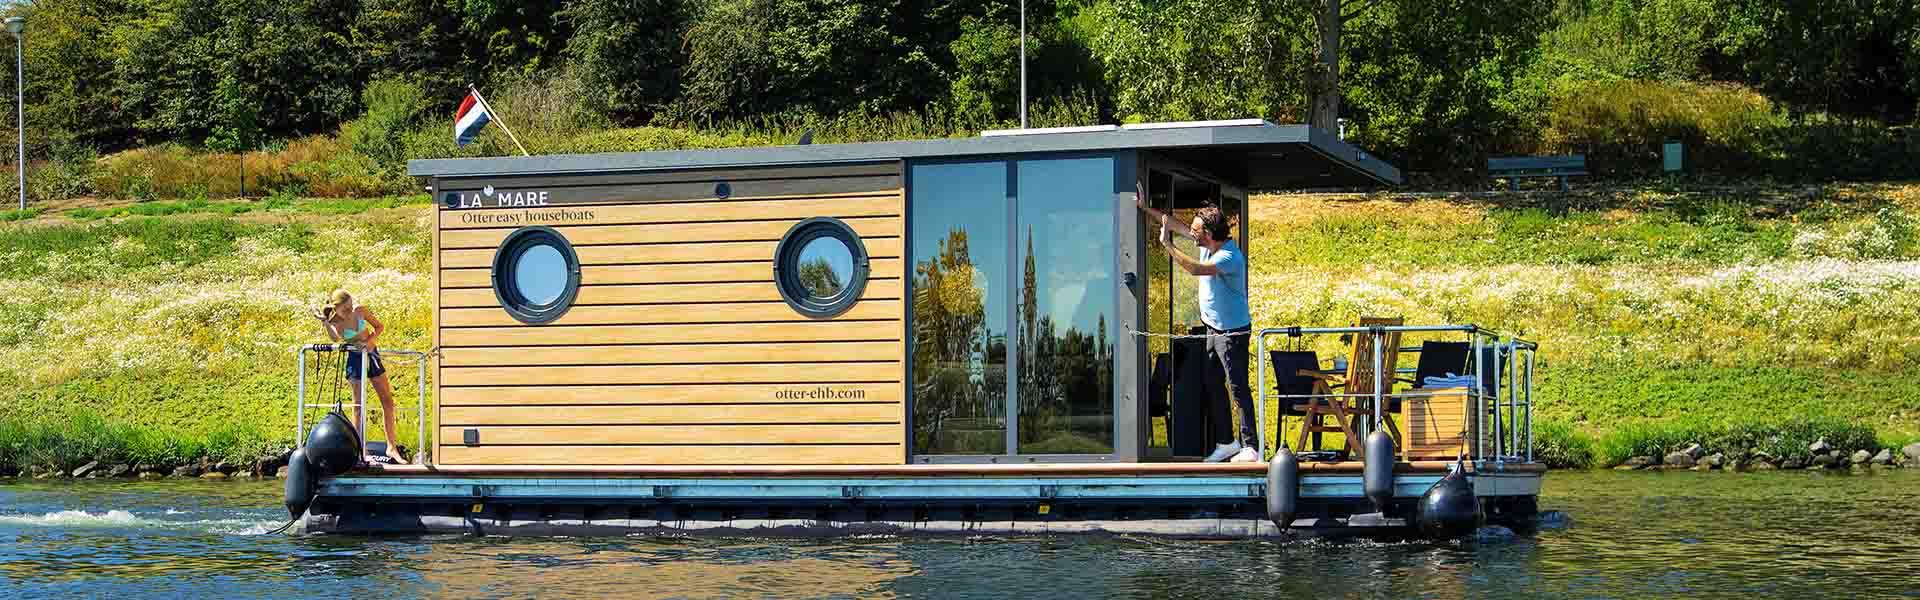 Comfortklasse M Otter Easy Houseboats exterieur4